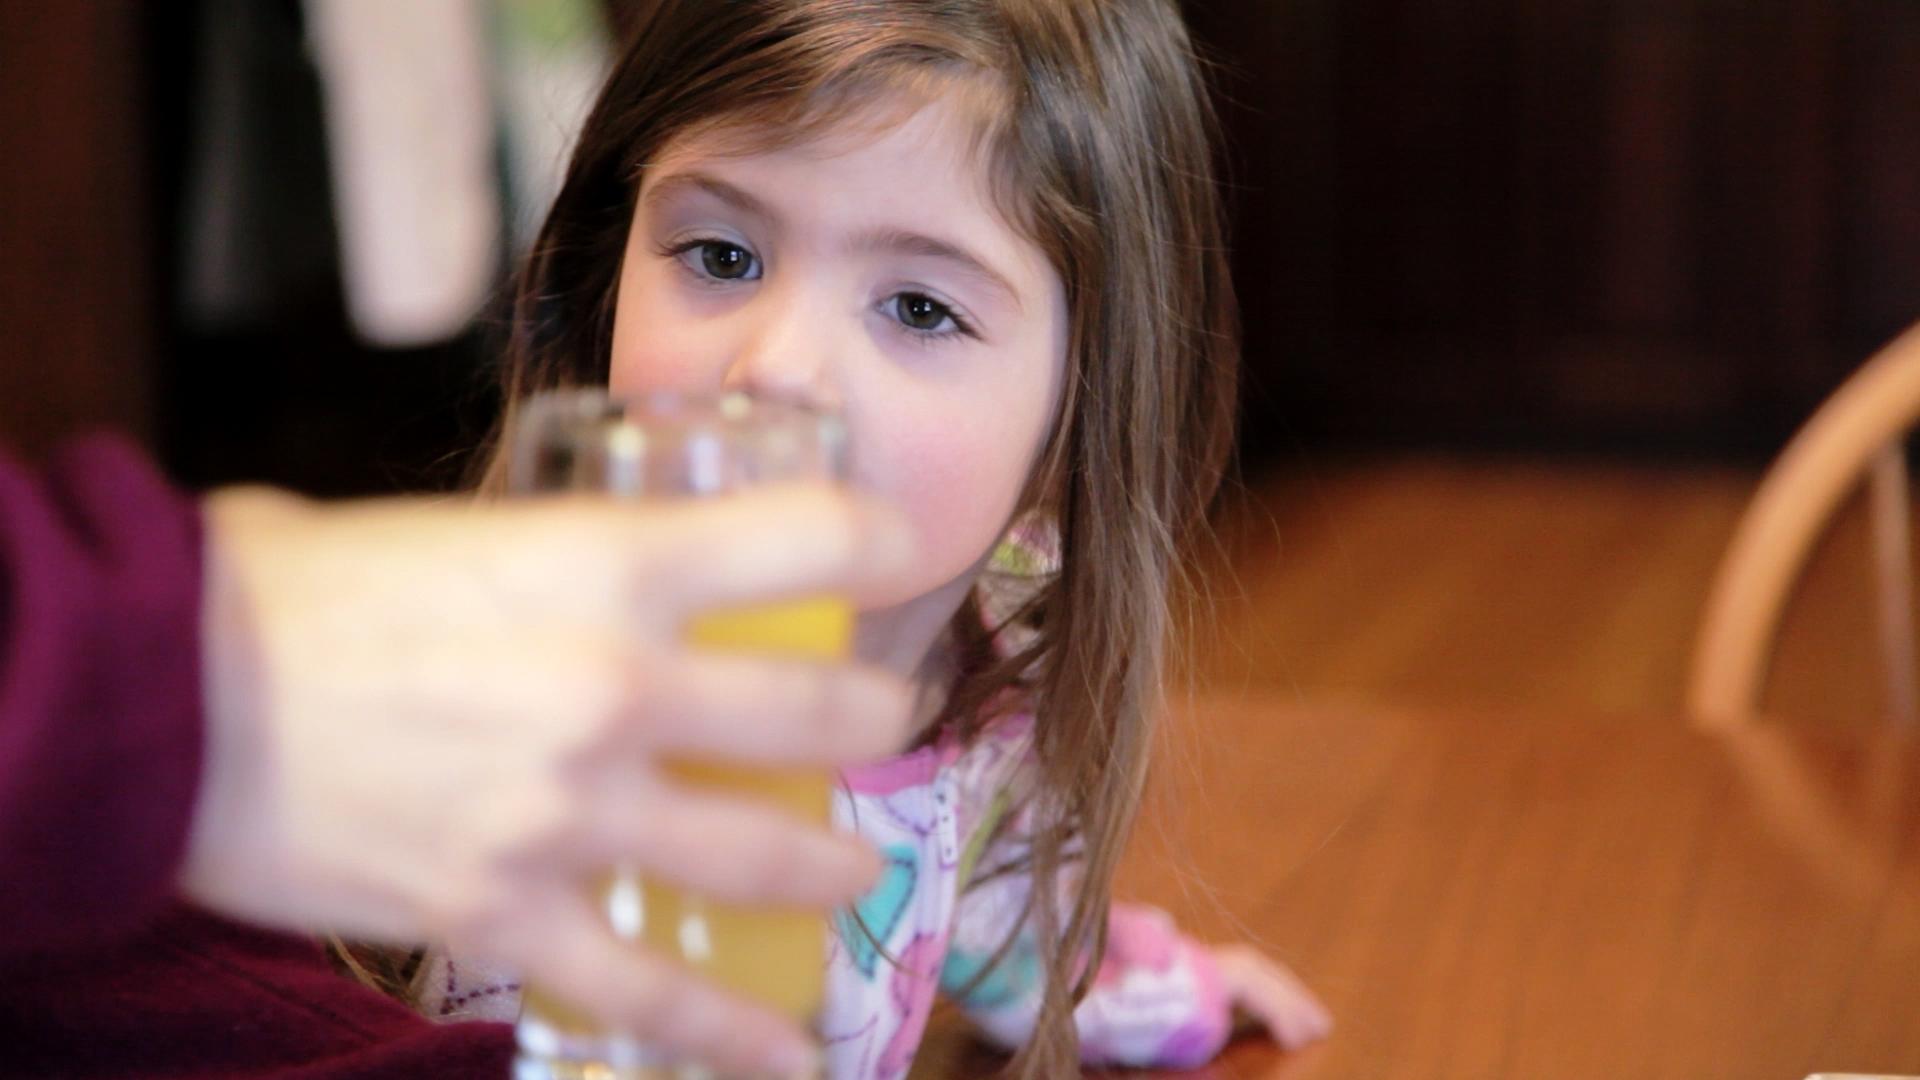 Isabella Putnam in Geena Matuson's (@geenamatuson) short film 'Ice Cream for Breakfast' (2013).